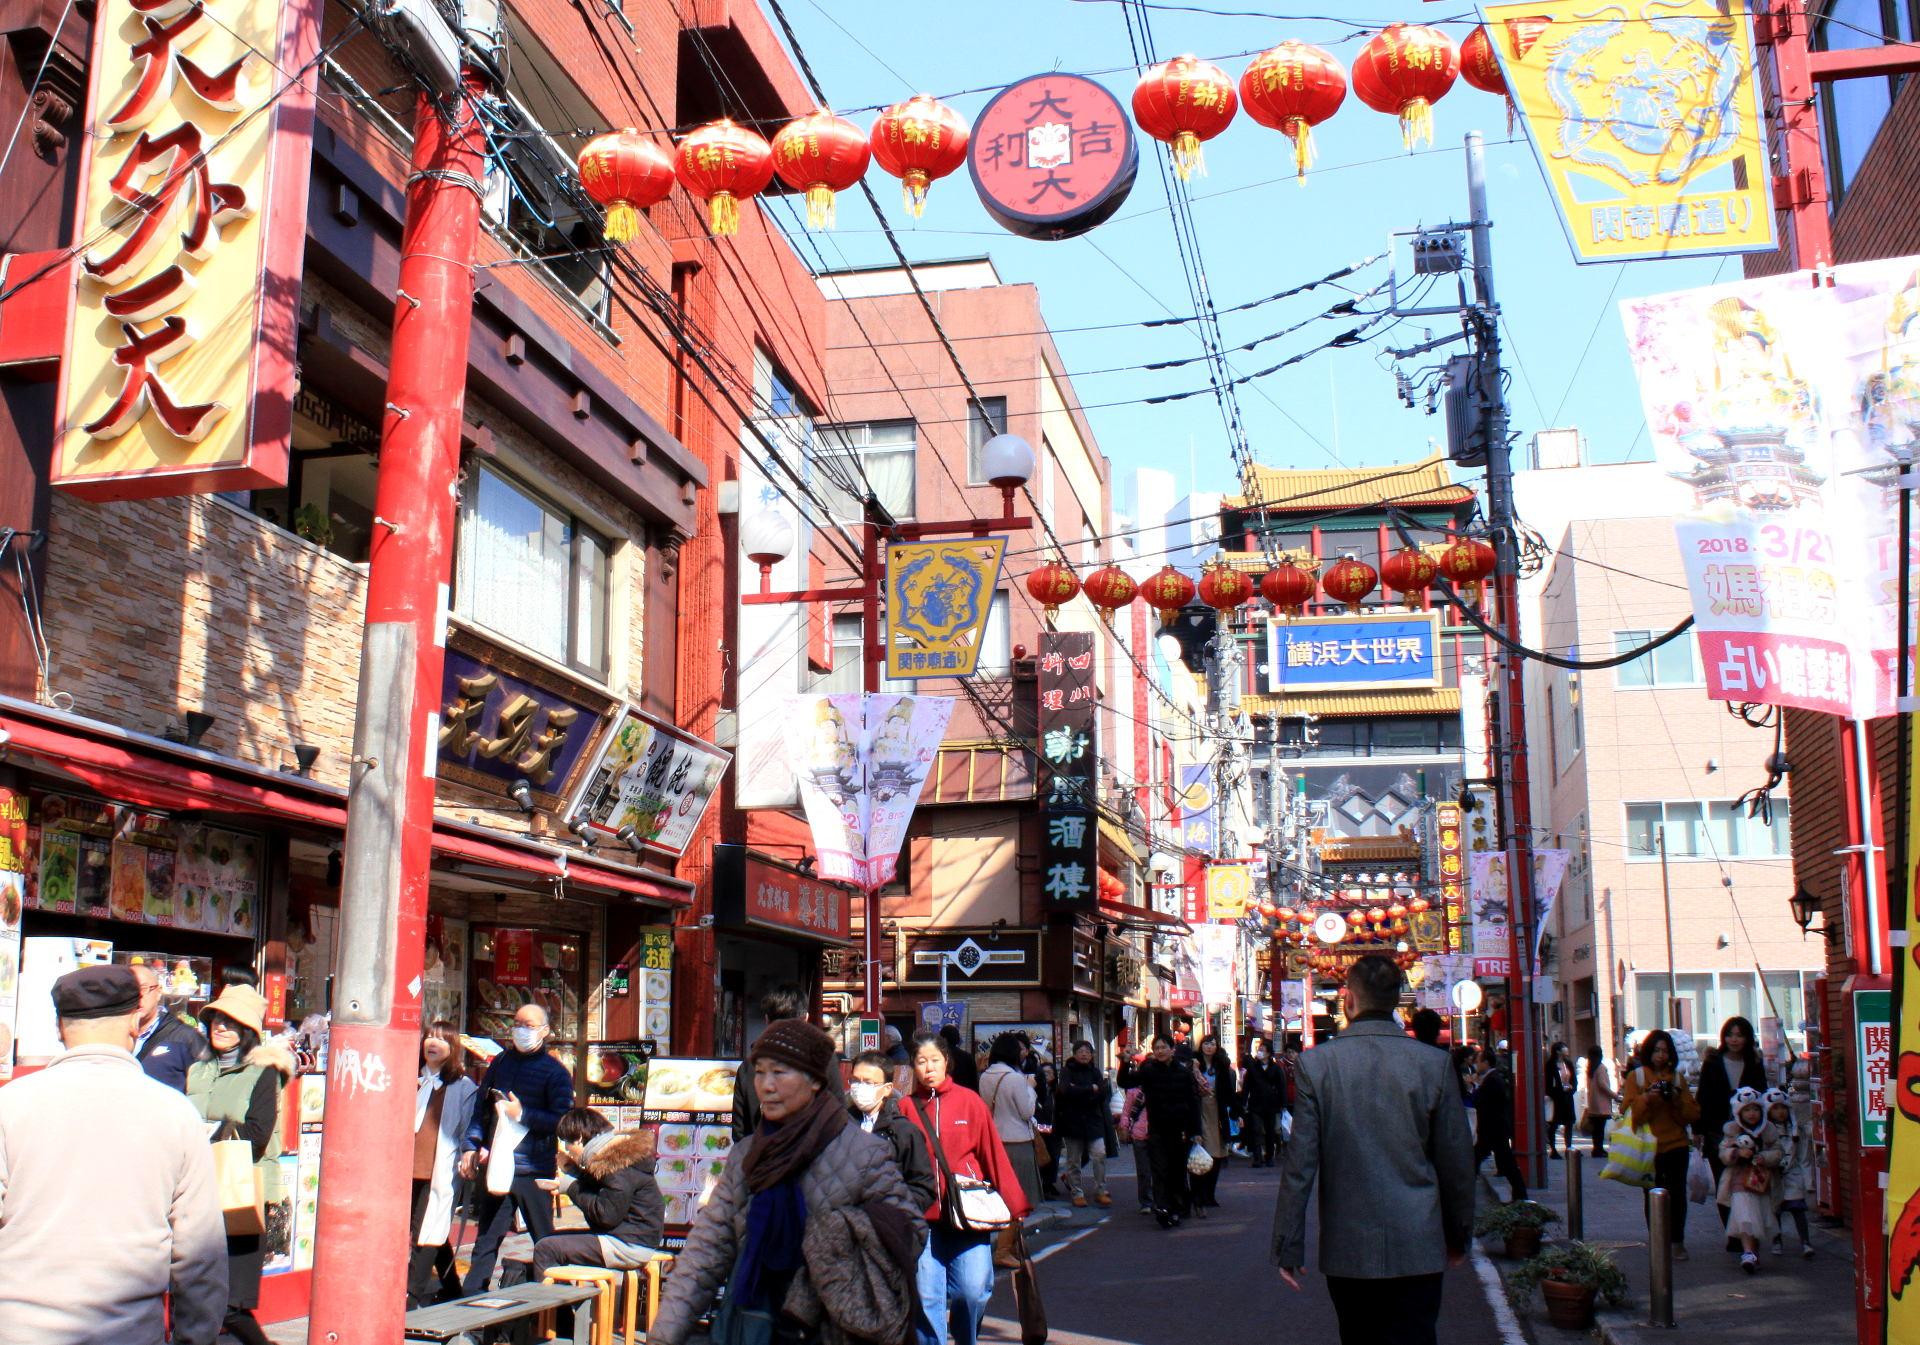 yokohama brama chinatown chinska dzielnica ulica iglawpodrozy